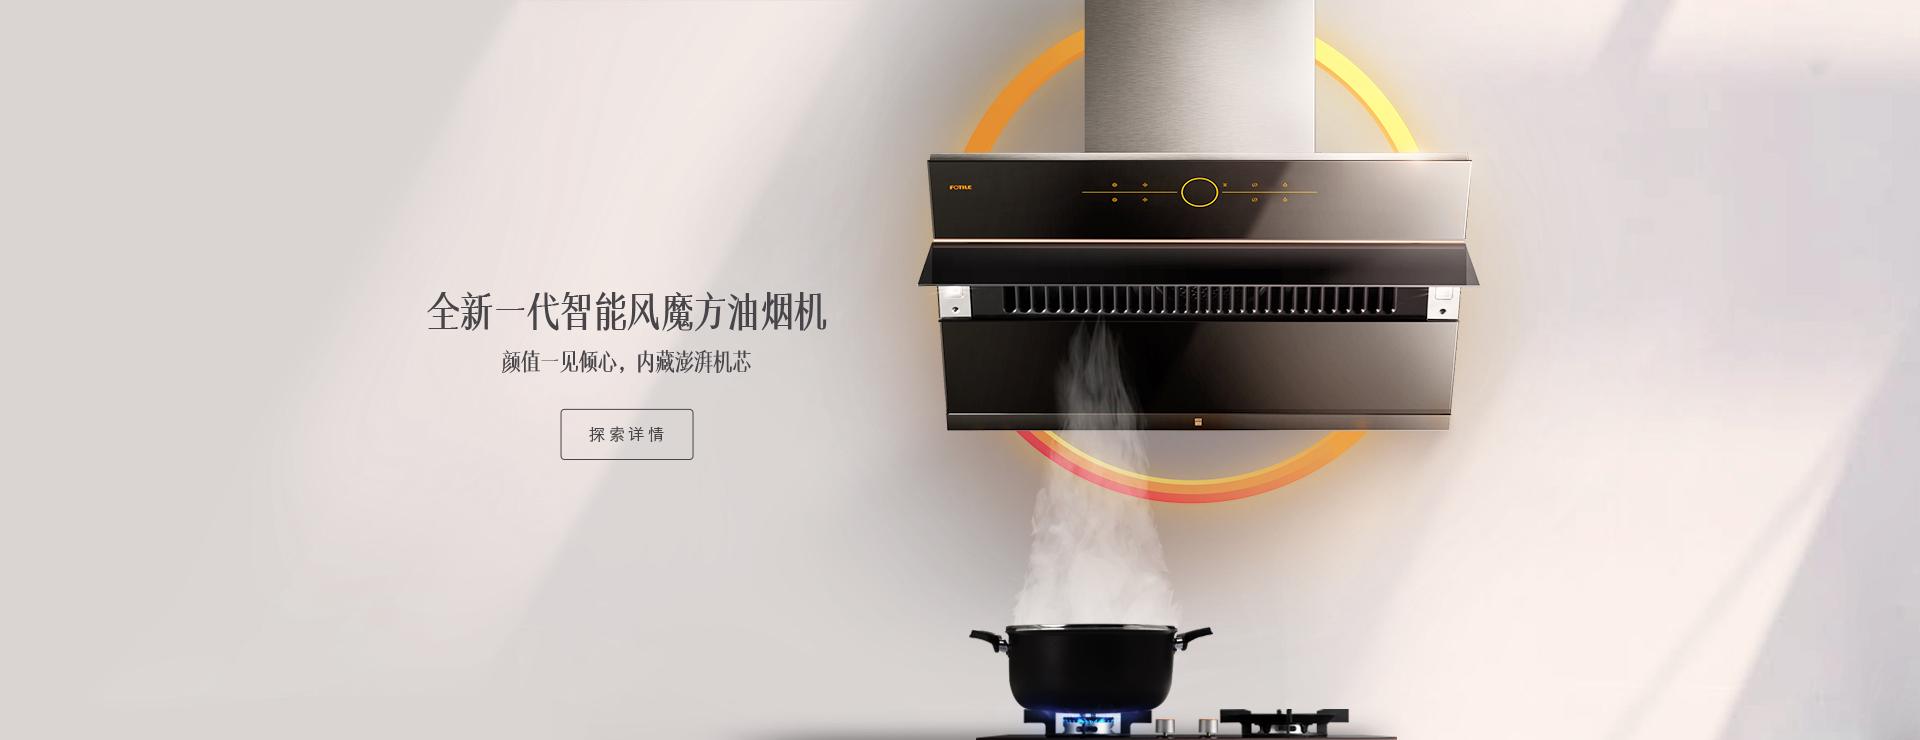 www.188bet.com风魔方,www.188bet.com油烟机